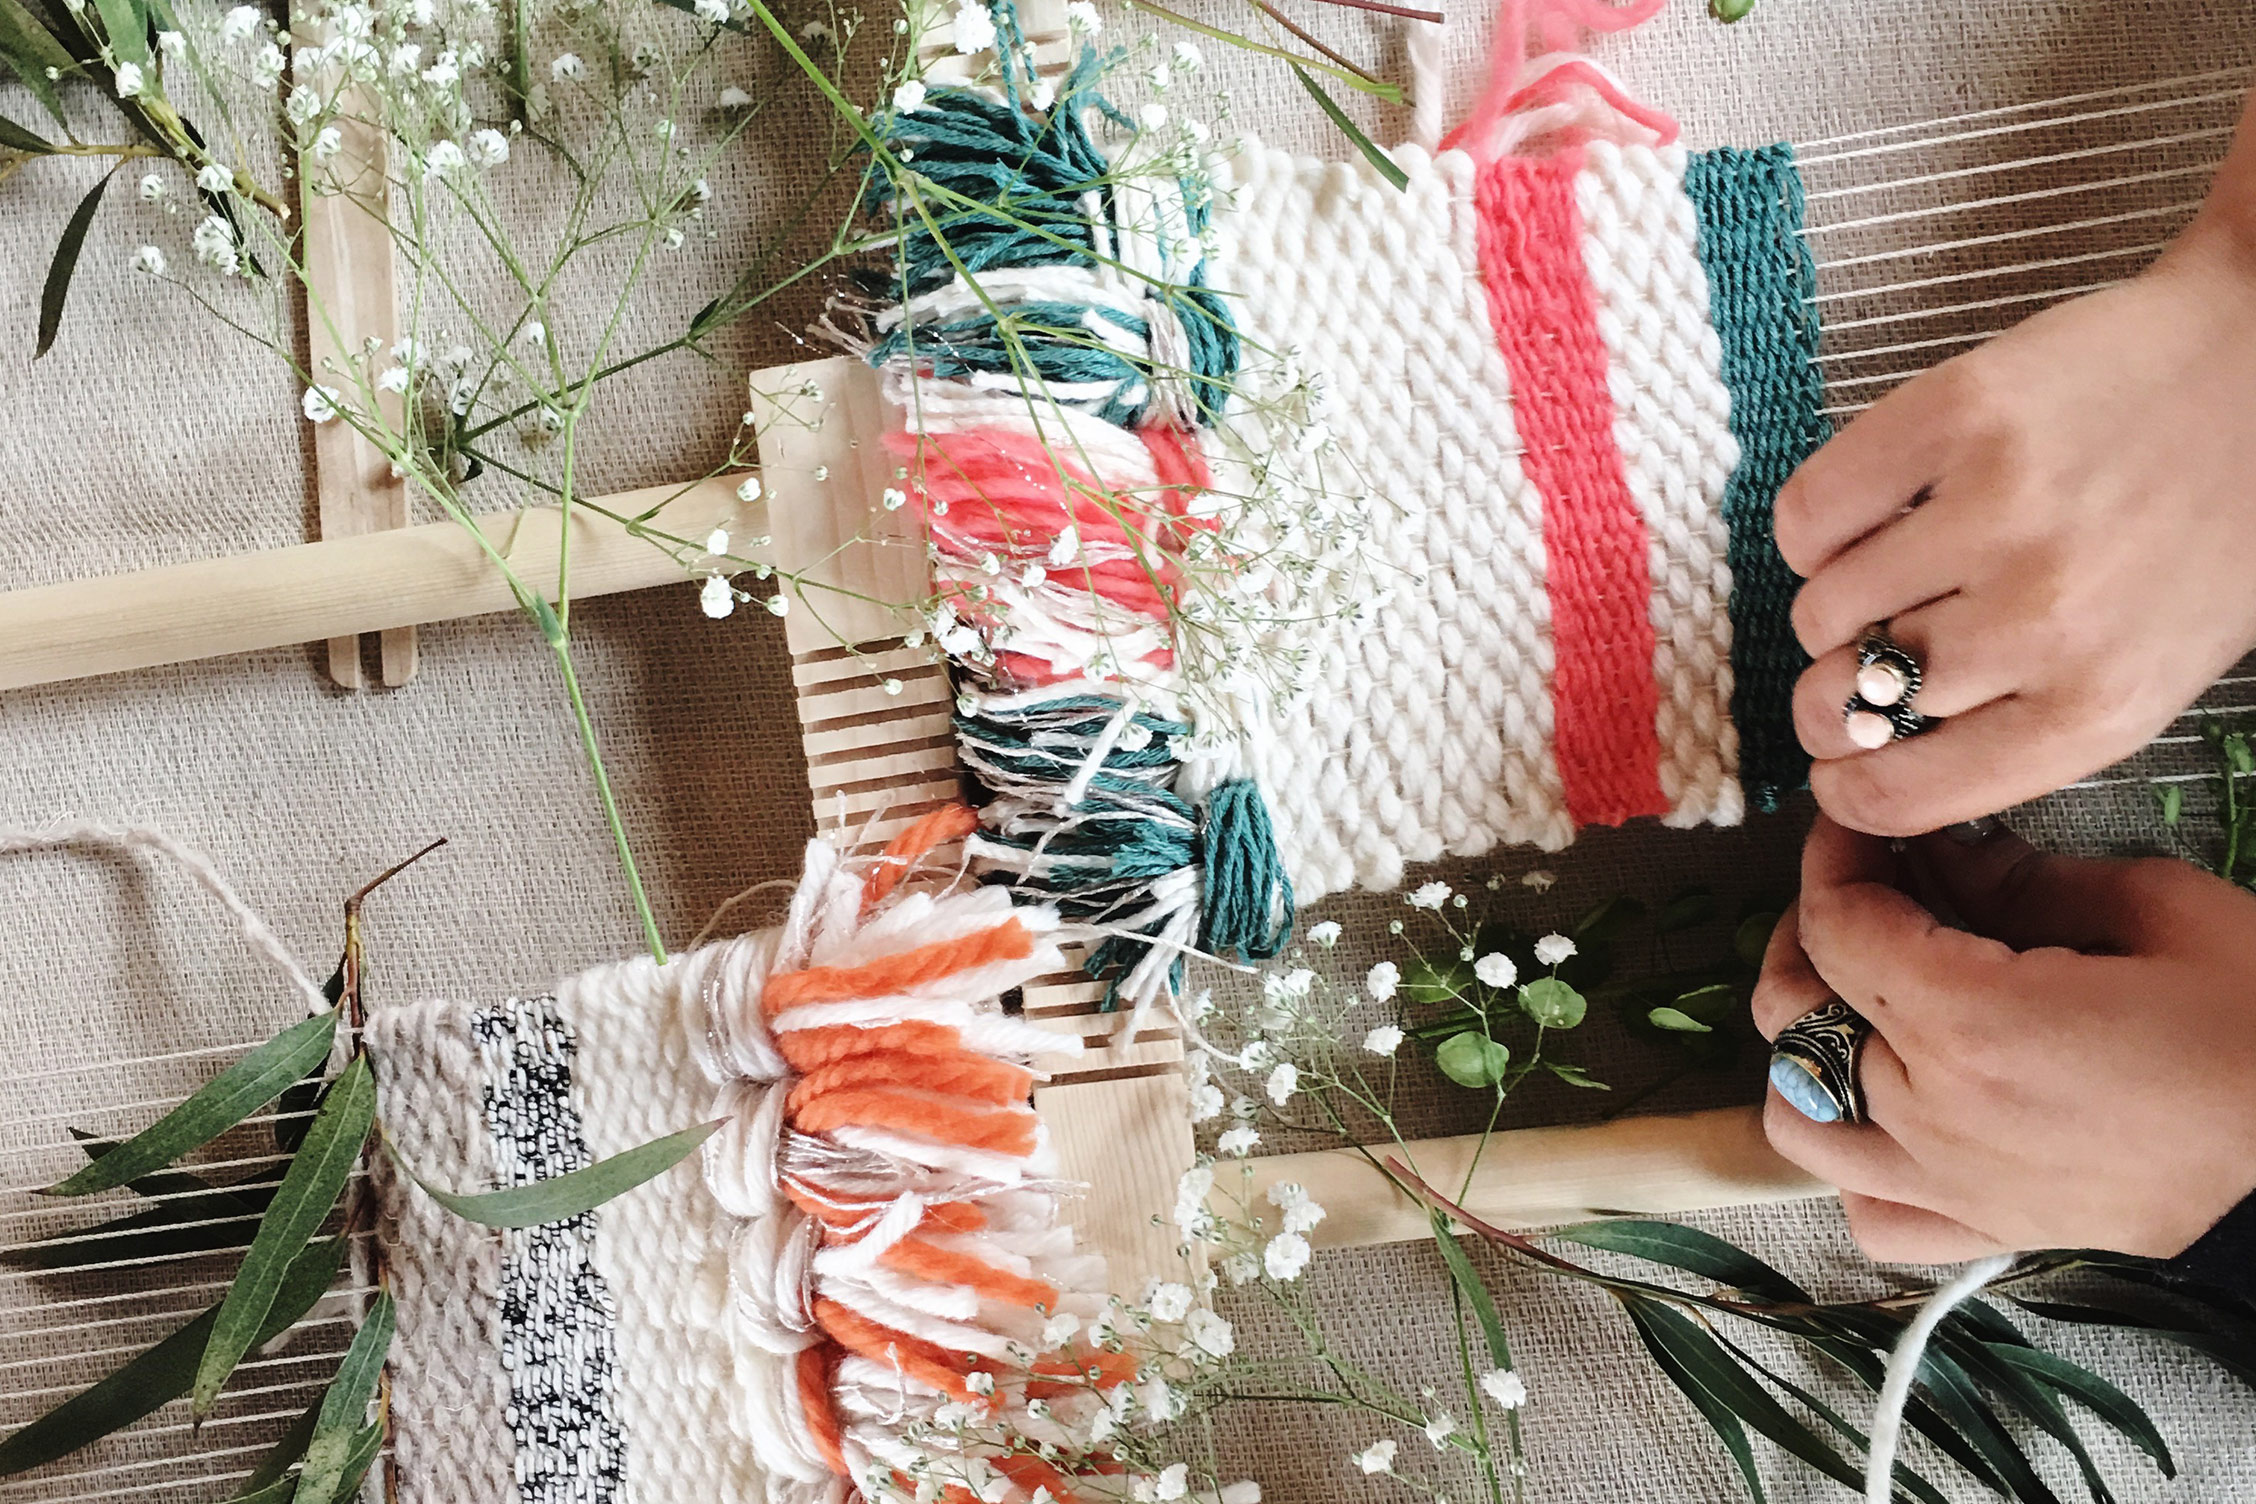 The Basic of Weaving workshop